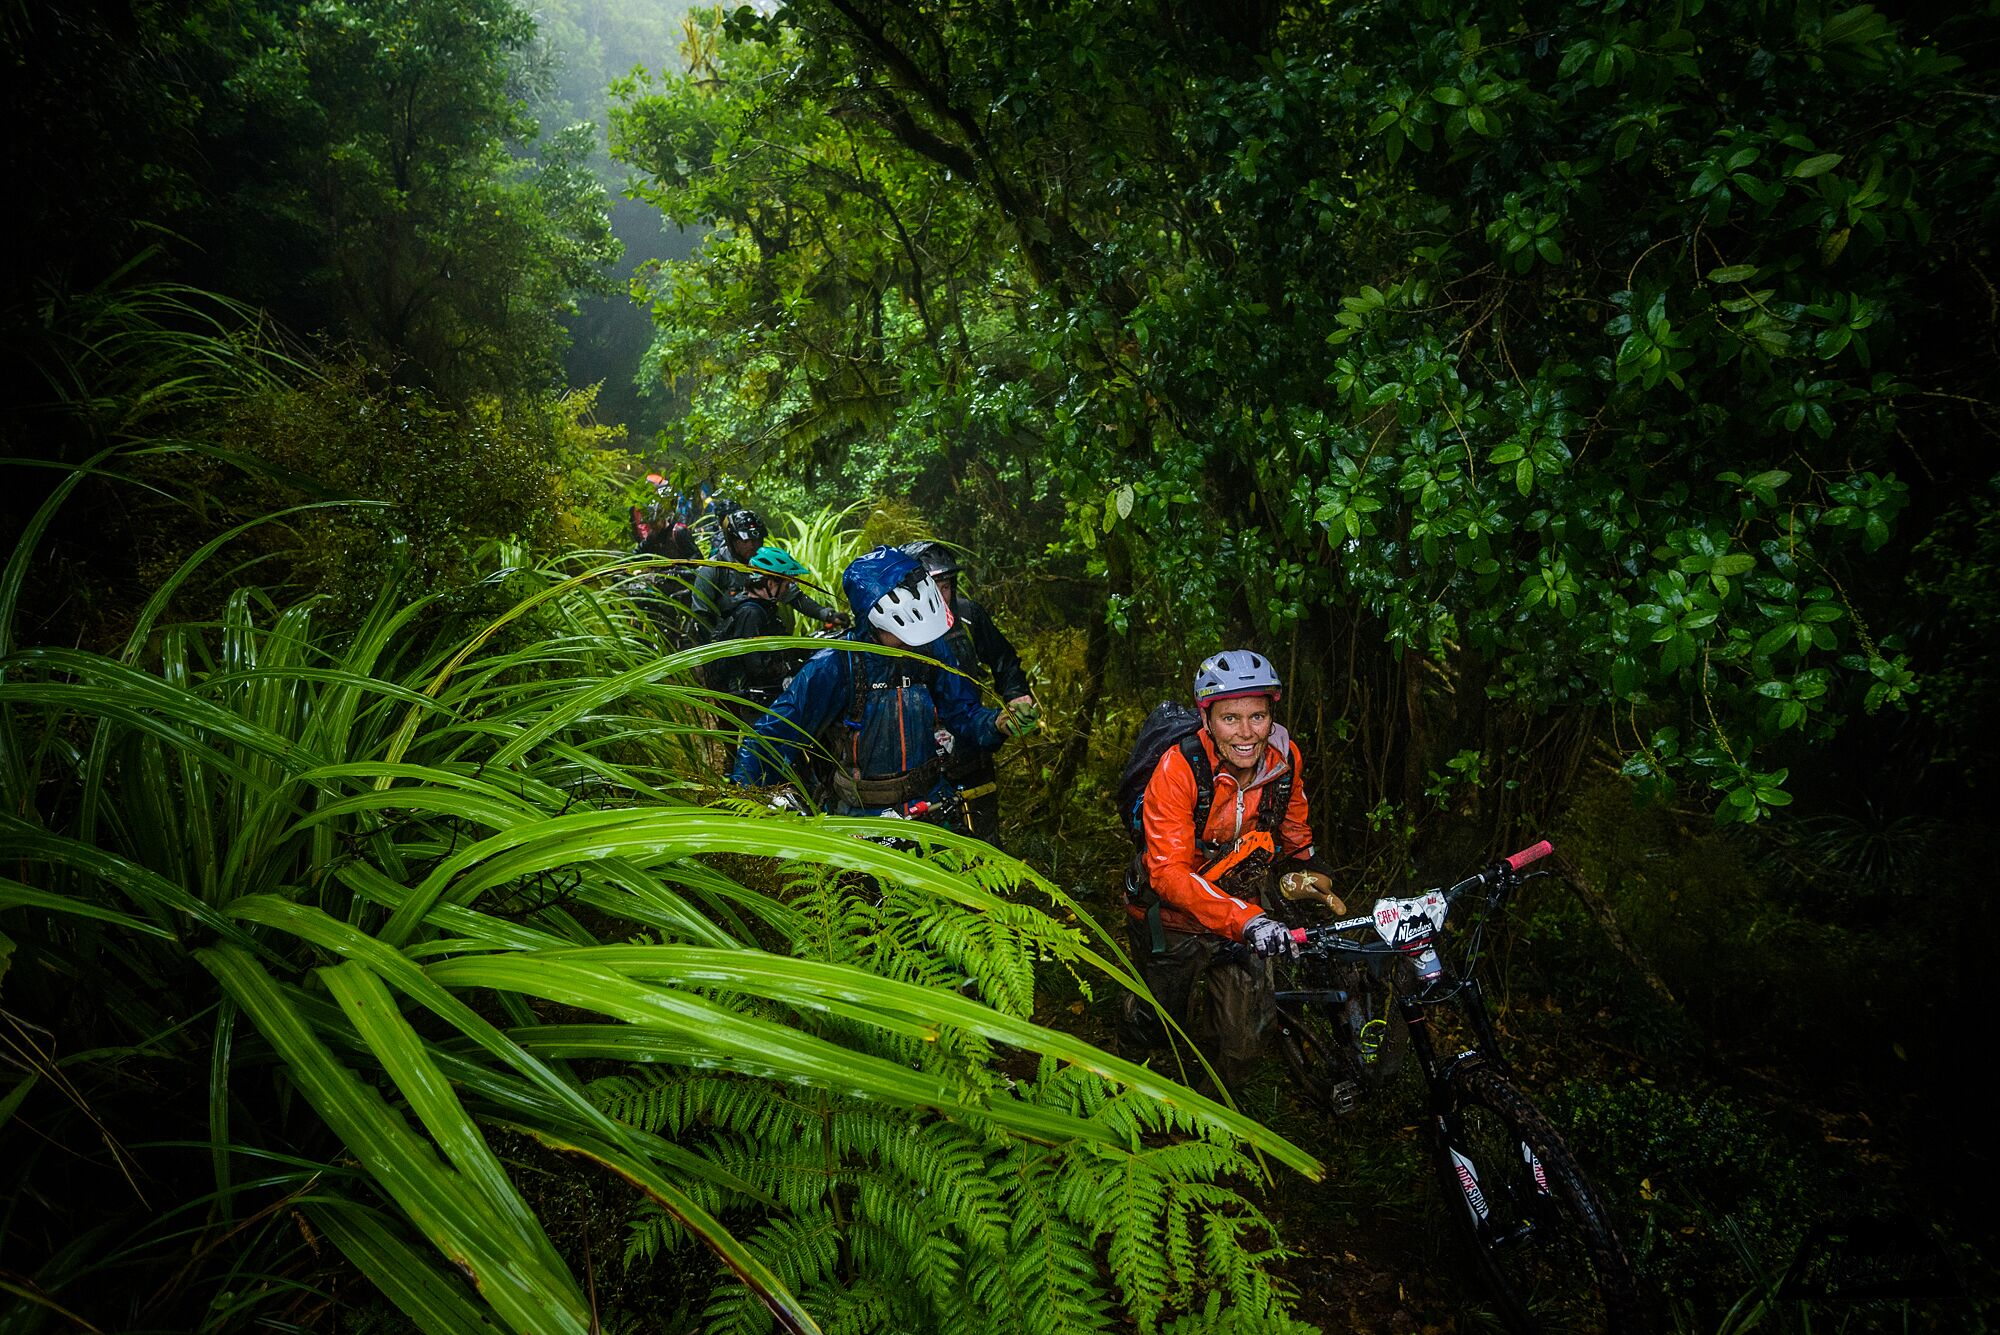 NZ enduro day 2 DIGBY-8_preview.jpg